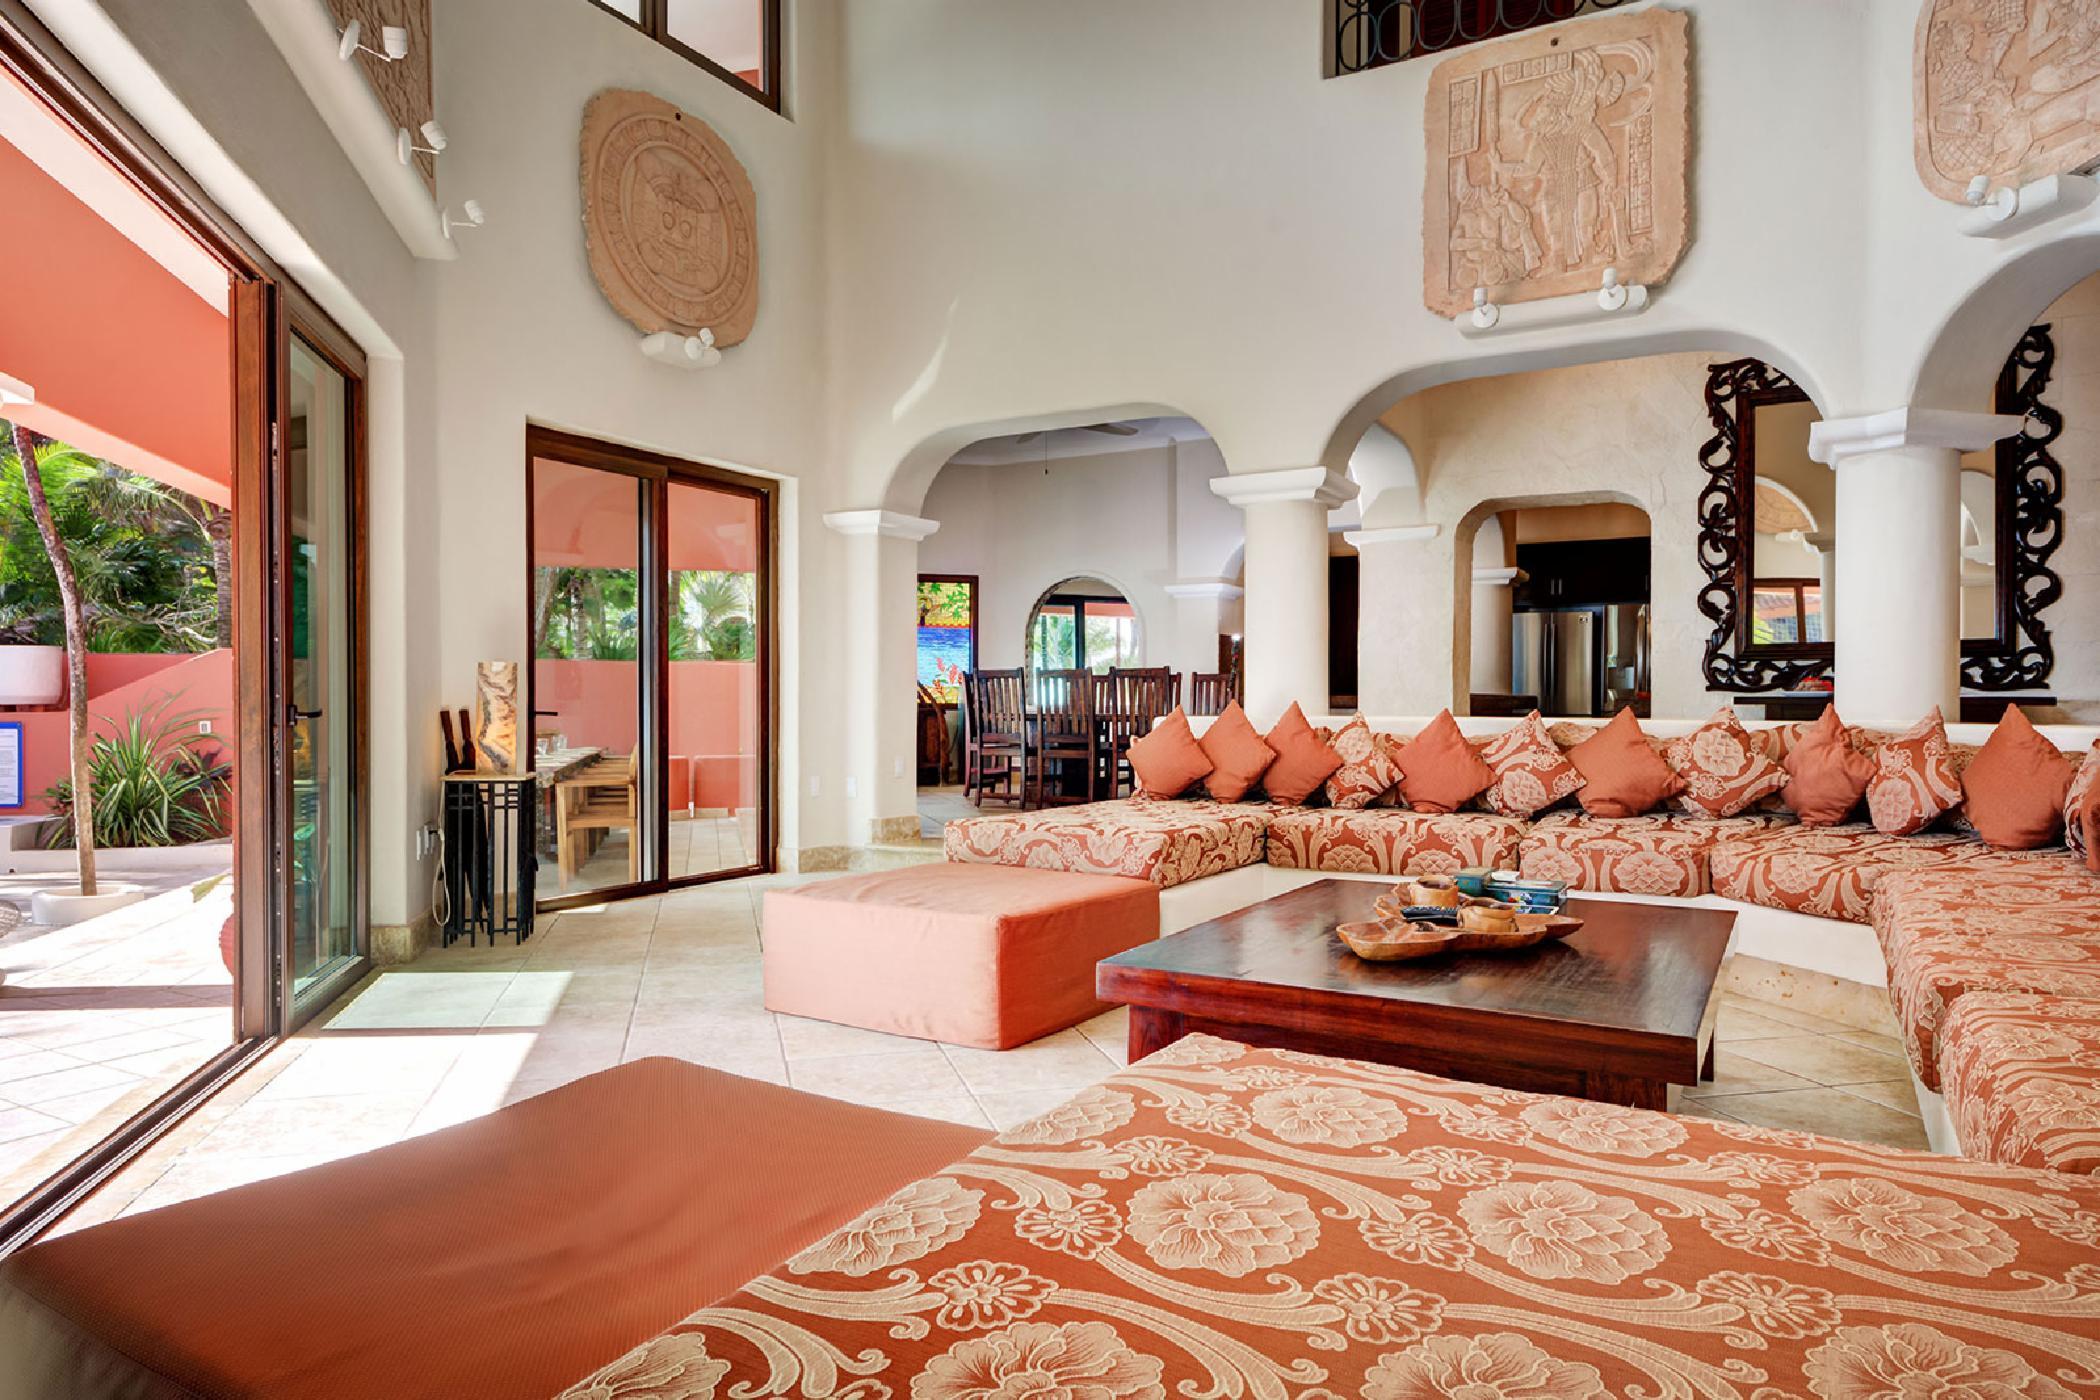 Agents_Maya_Luxe_Riviera_Maya_Luxury_Villas_Casa_Yardena13.jpg